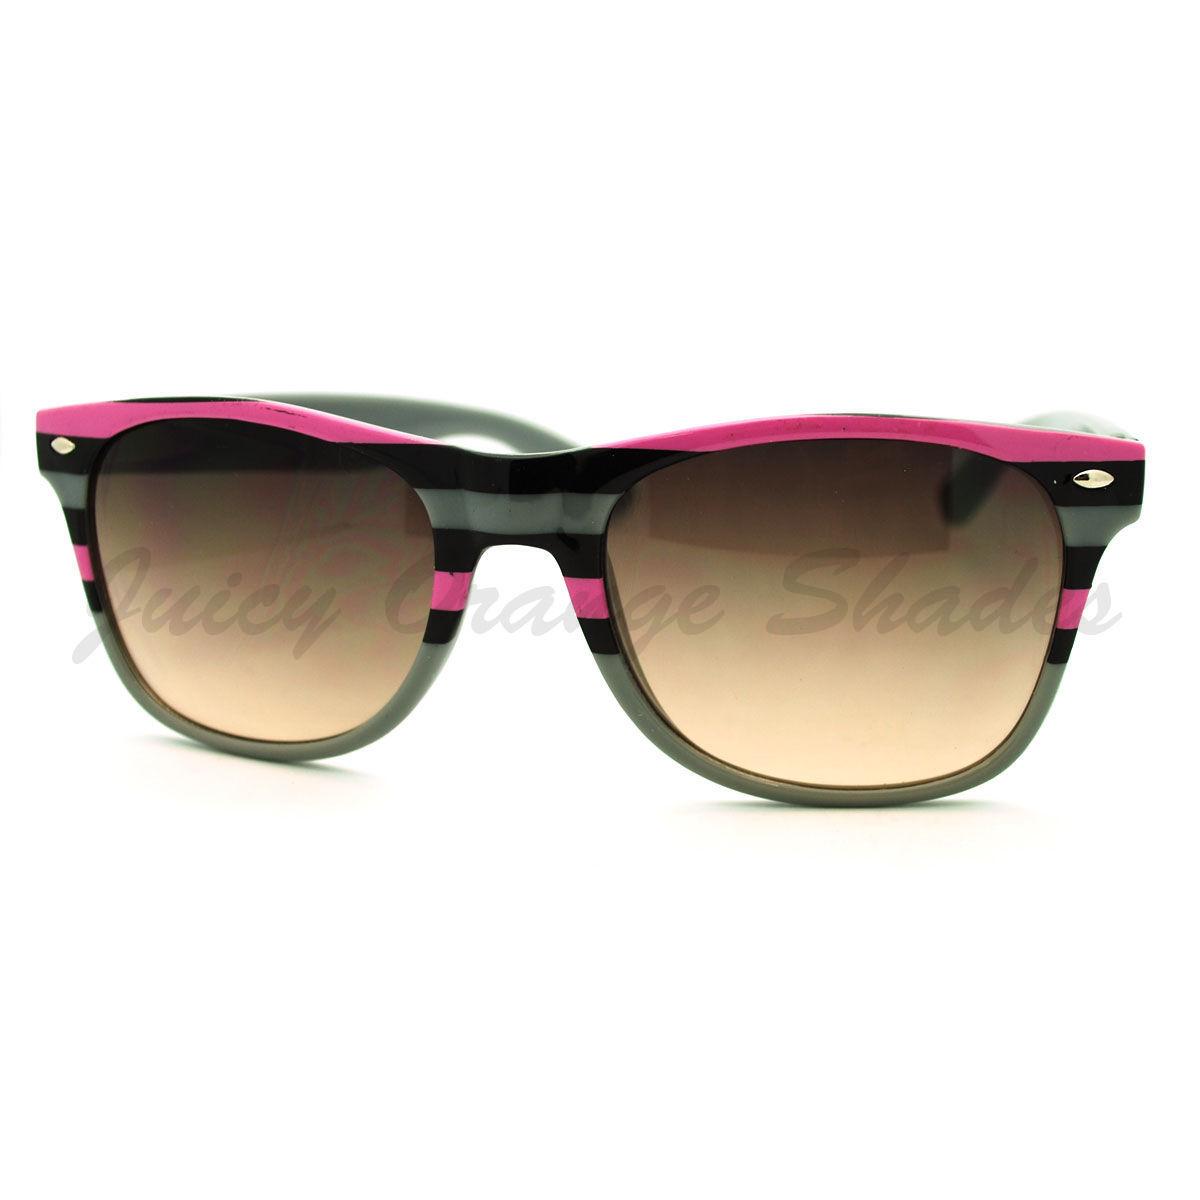 Stripe Print Sunglasses Classic Square Horn Rim Frame Unisex